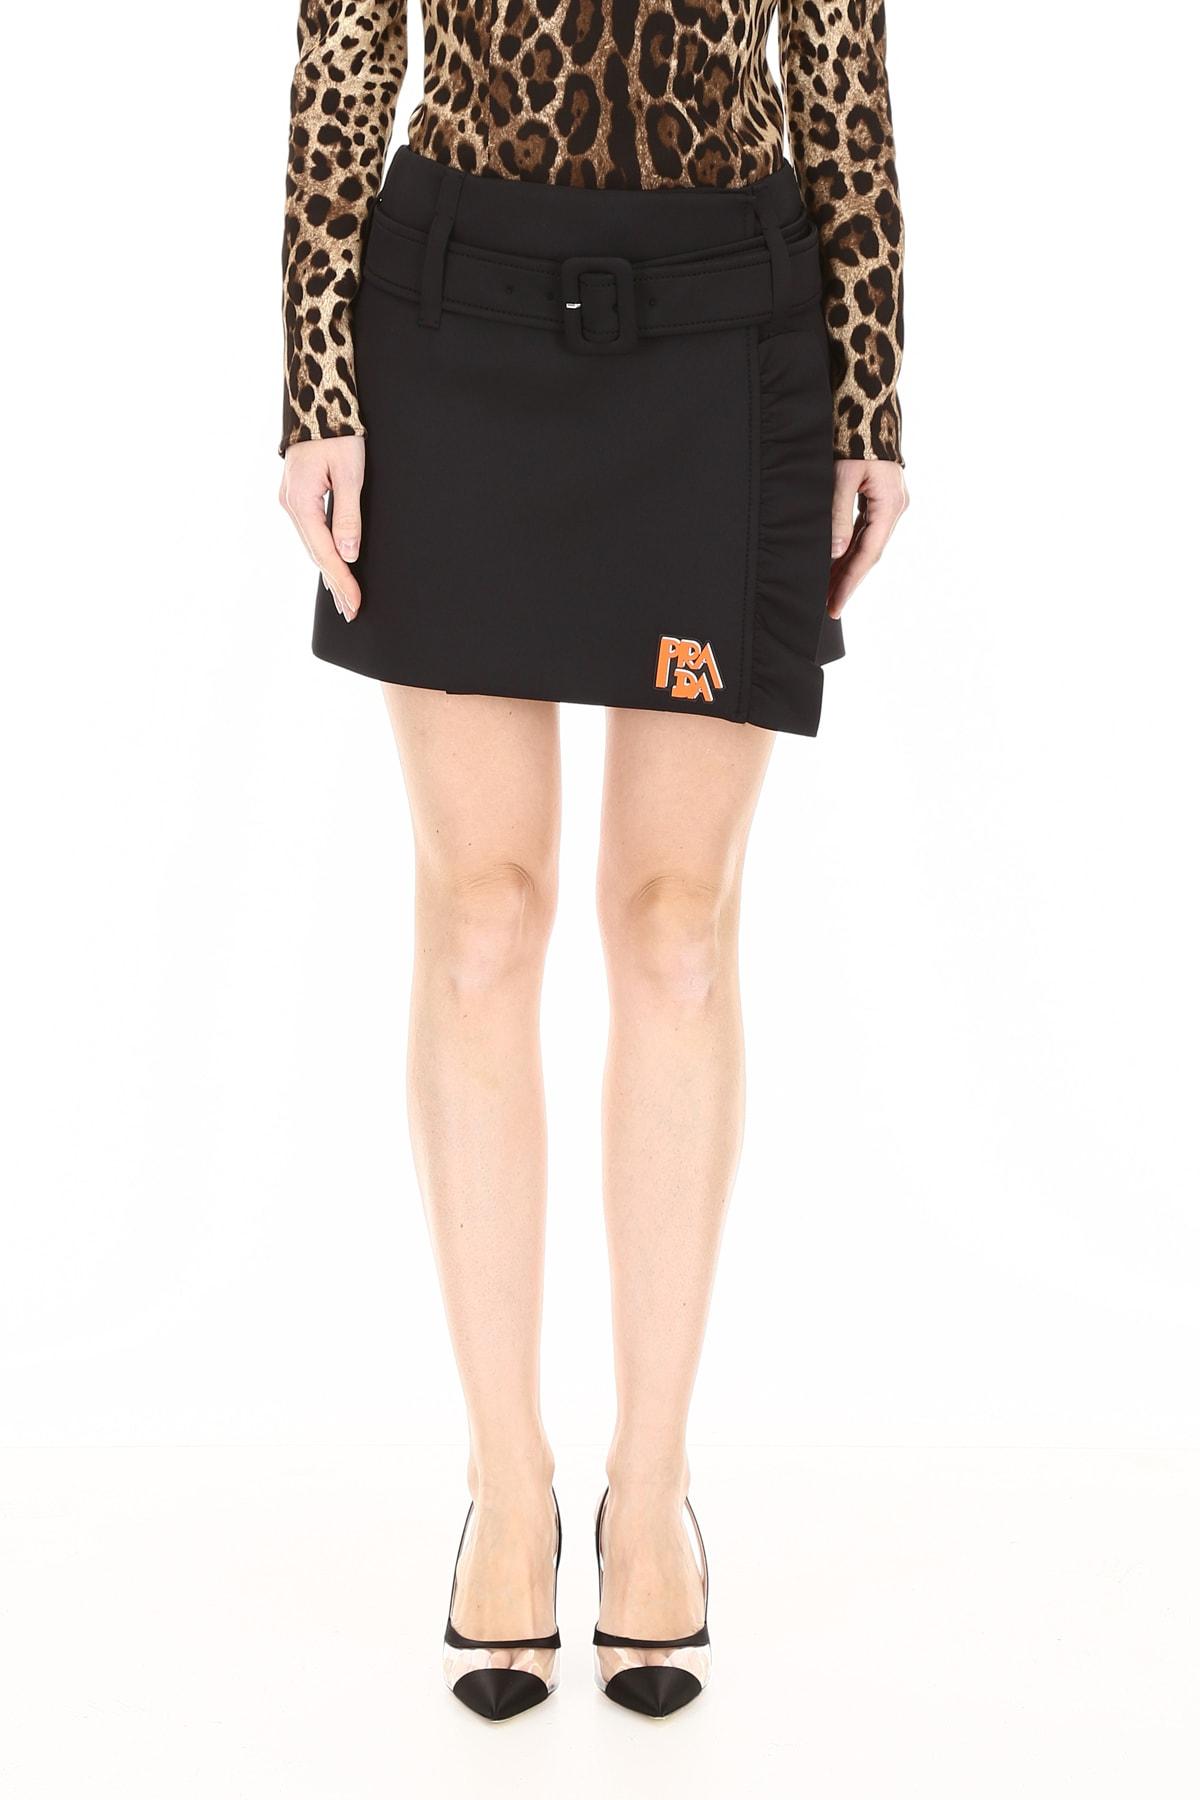 6d13619bc9a90 Prada Ruffled Mini Skirt With Logo